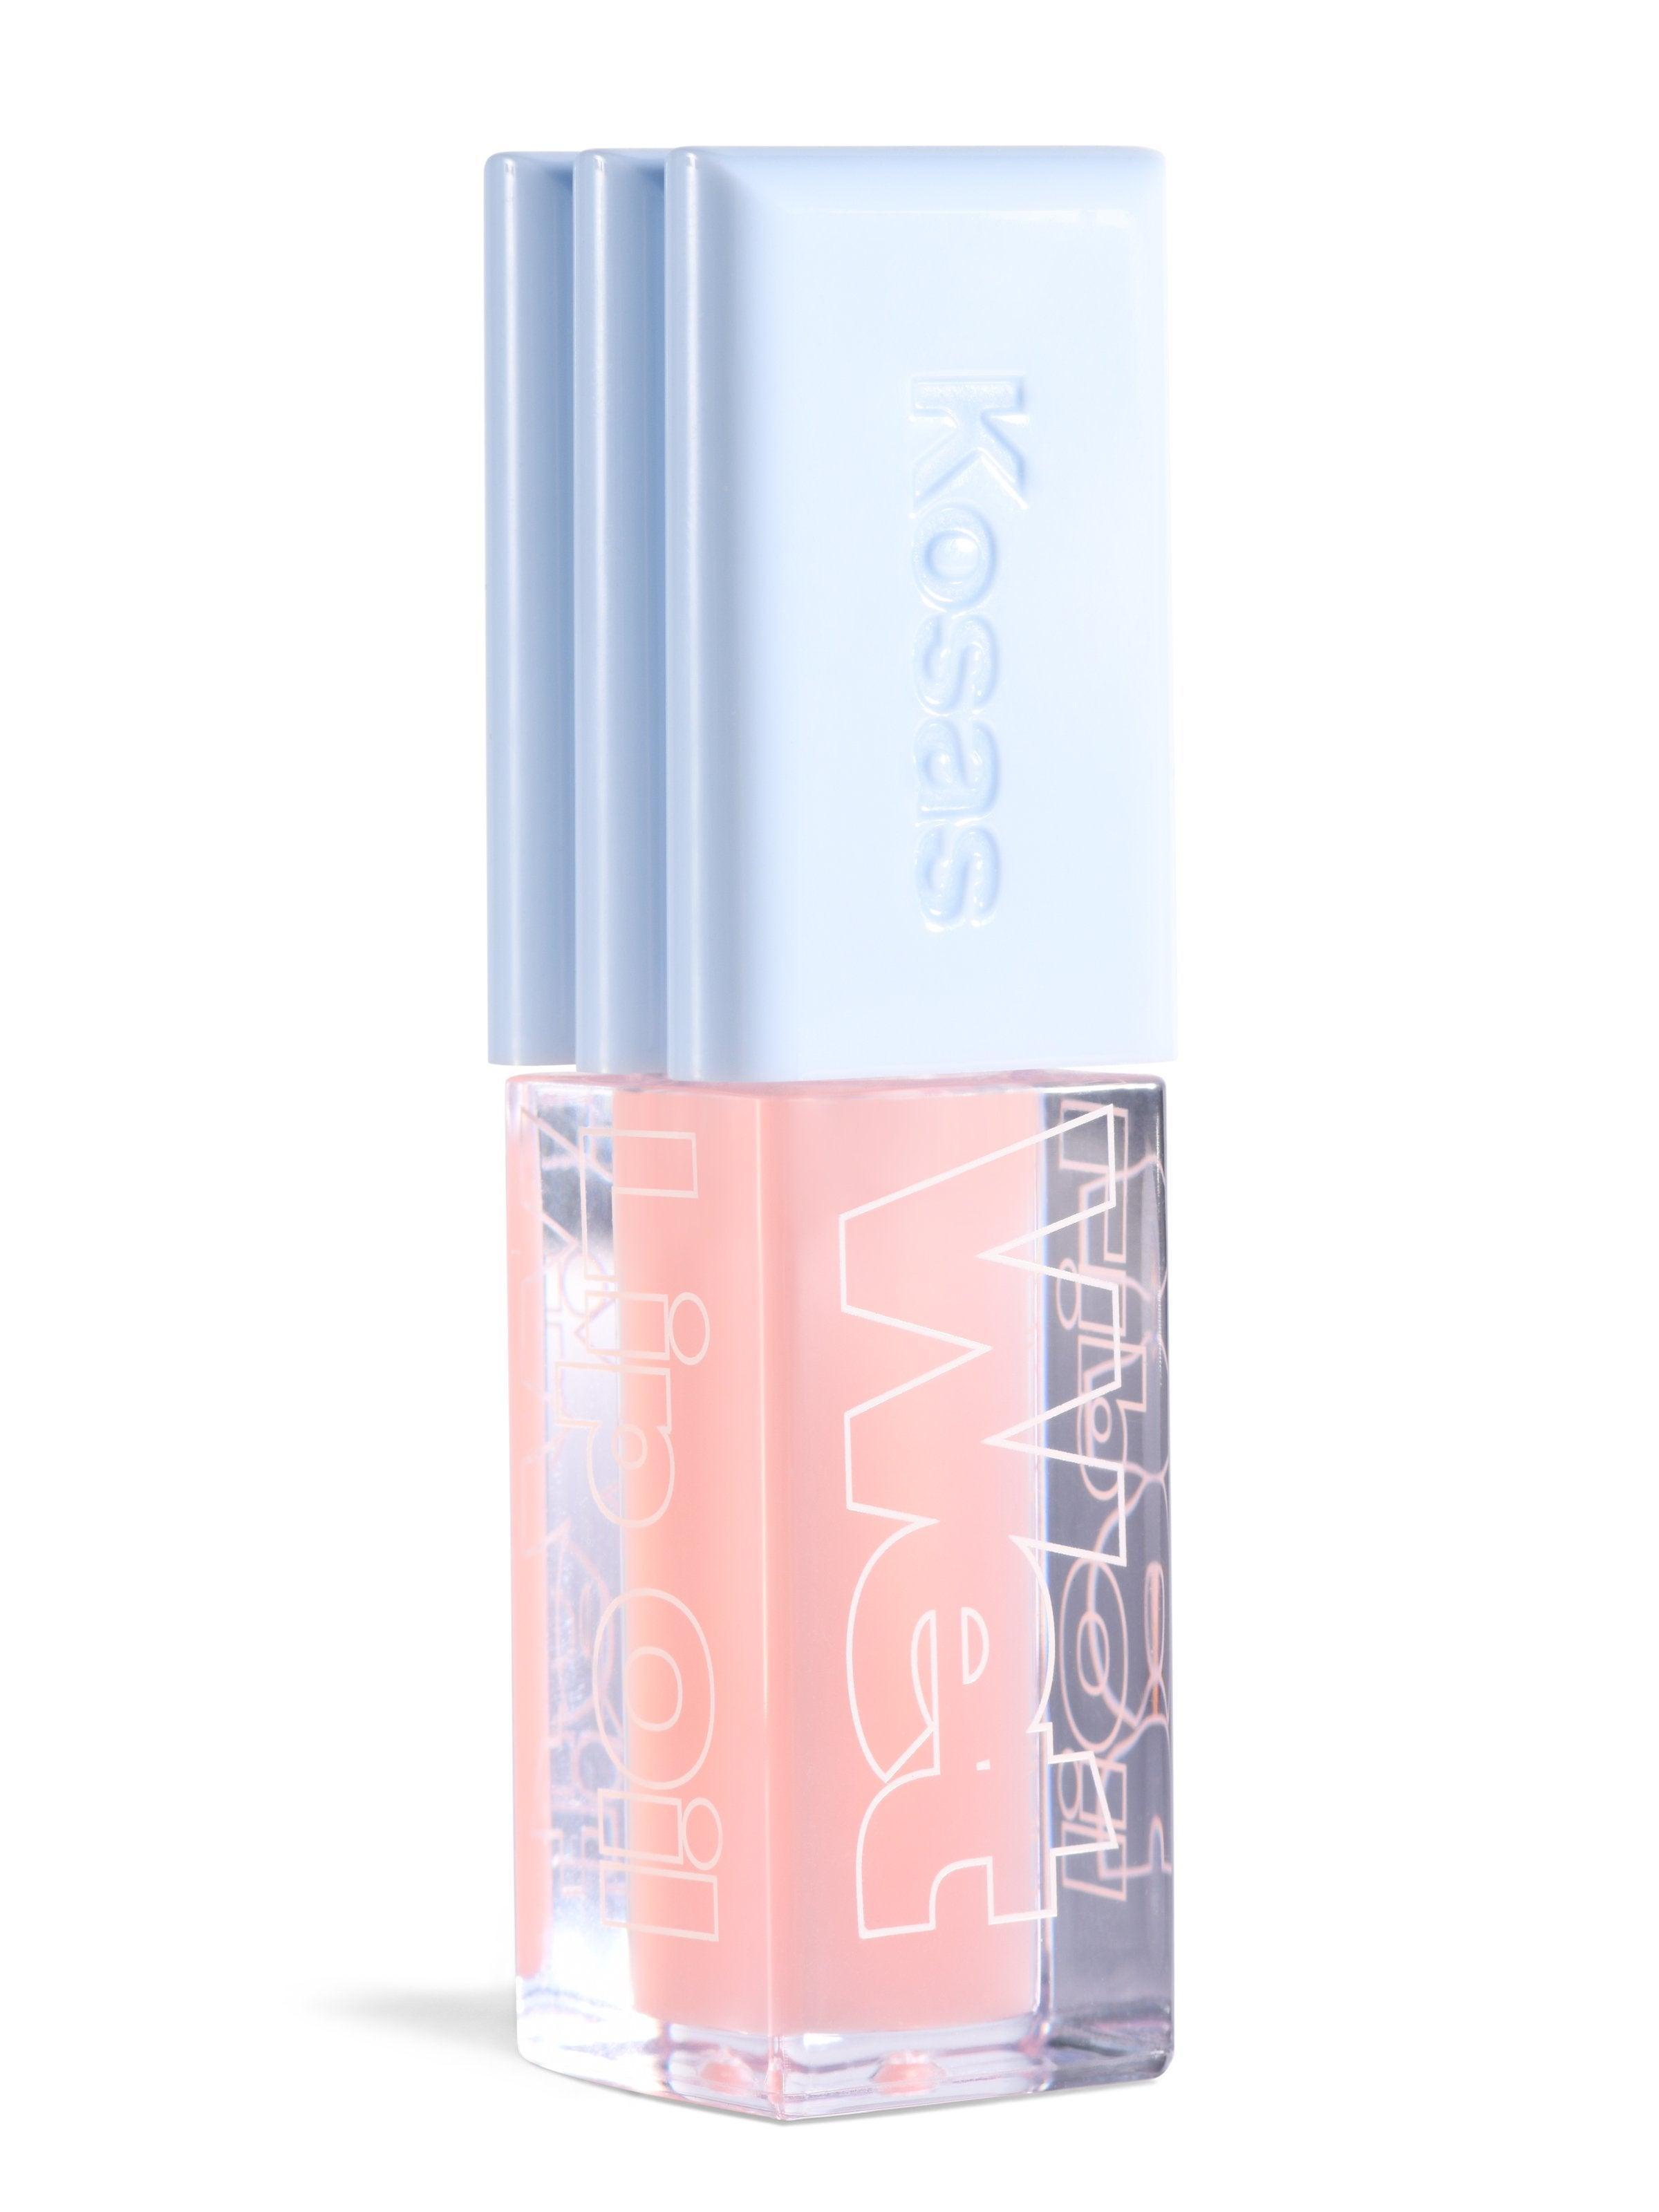 Revealer Super Creamy + Brightening Concealer by Kosas #16